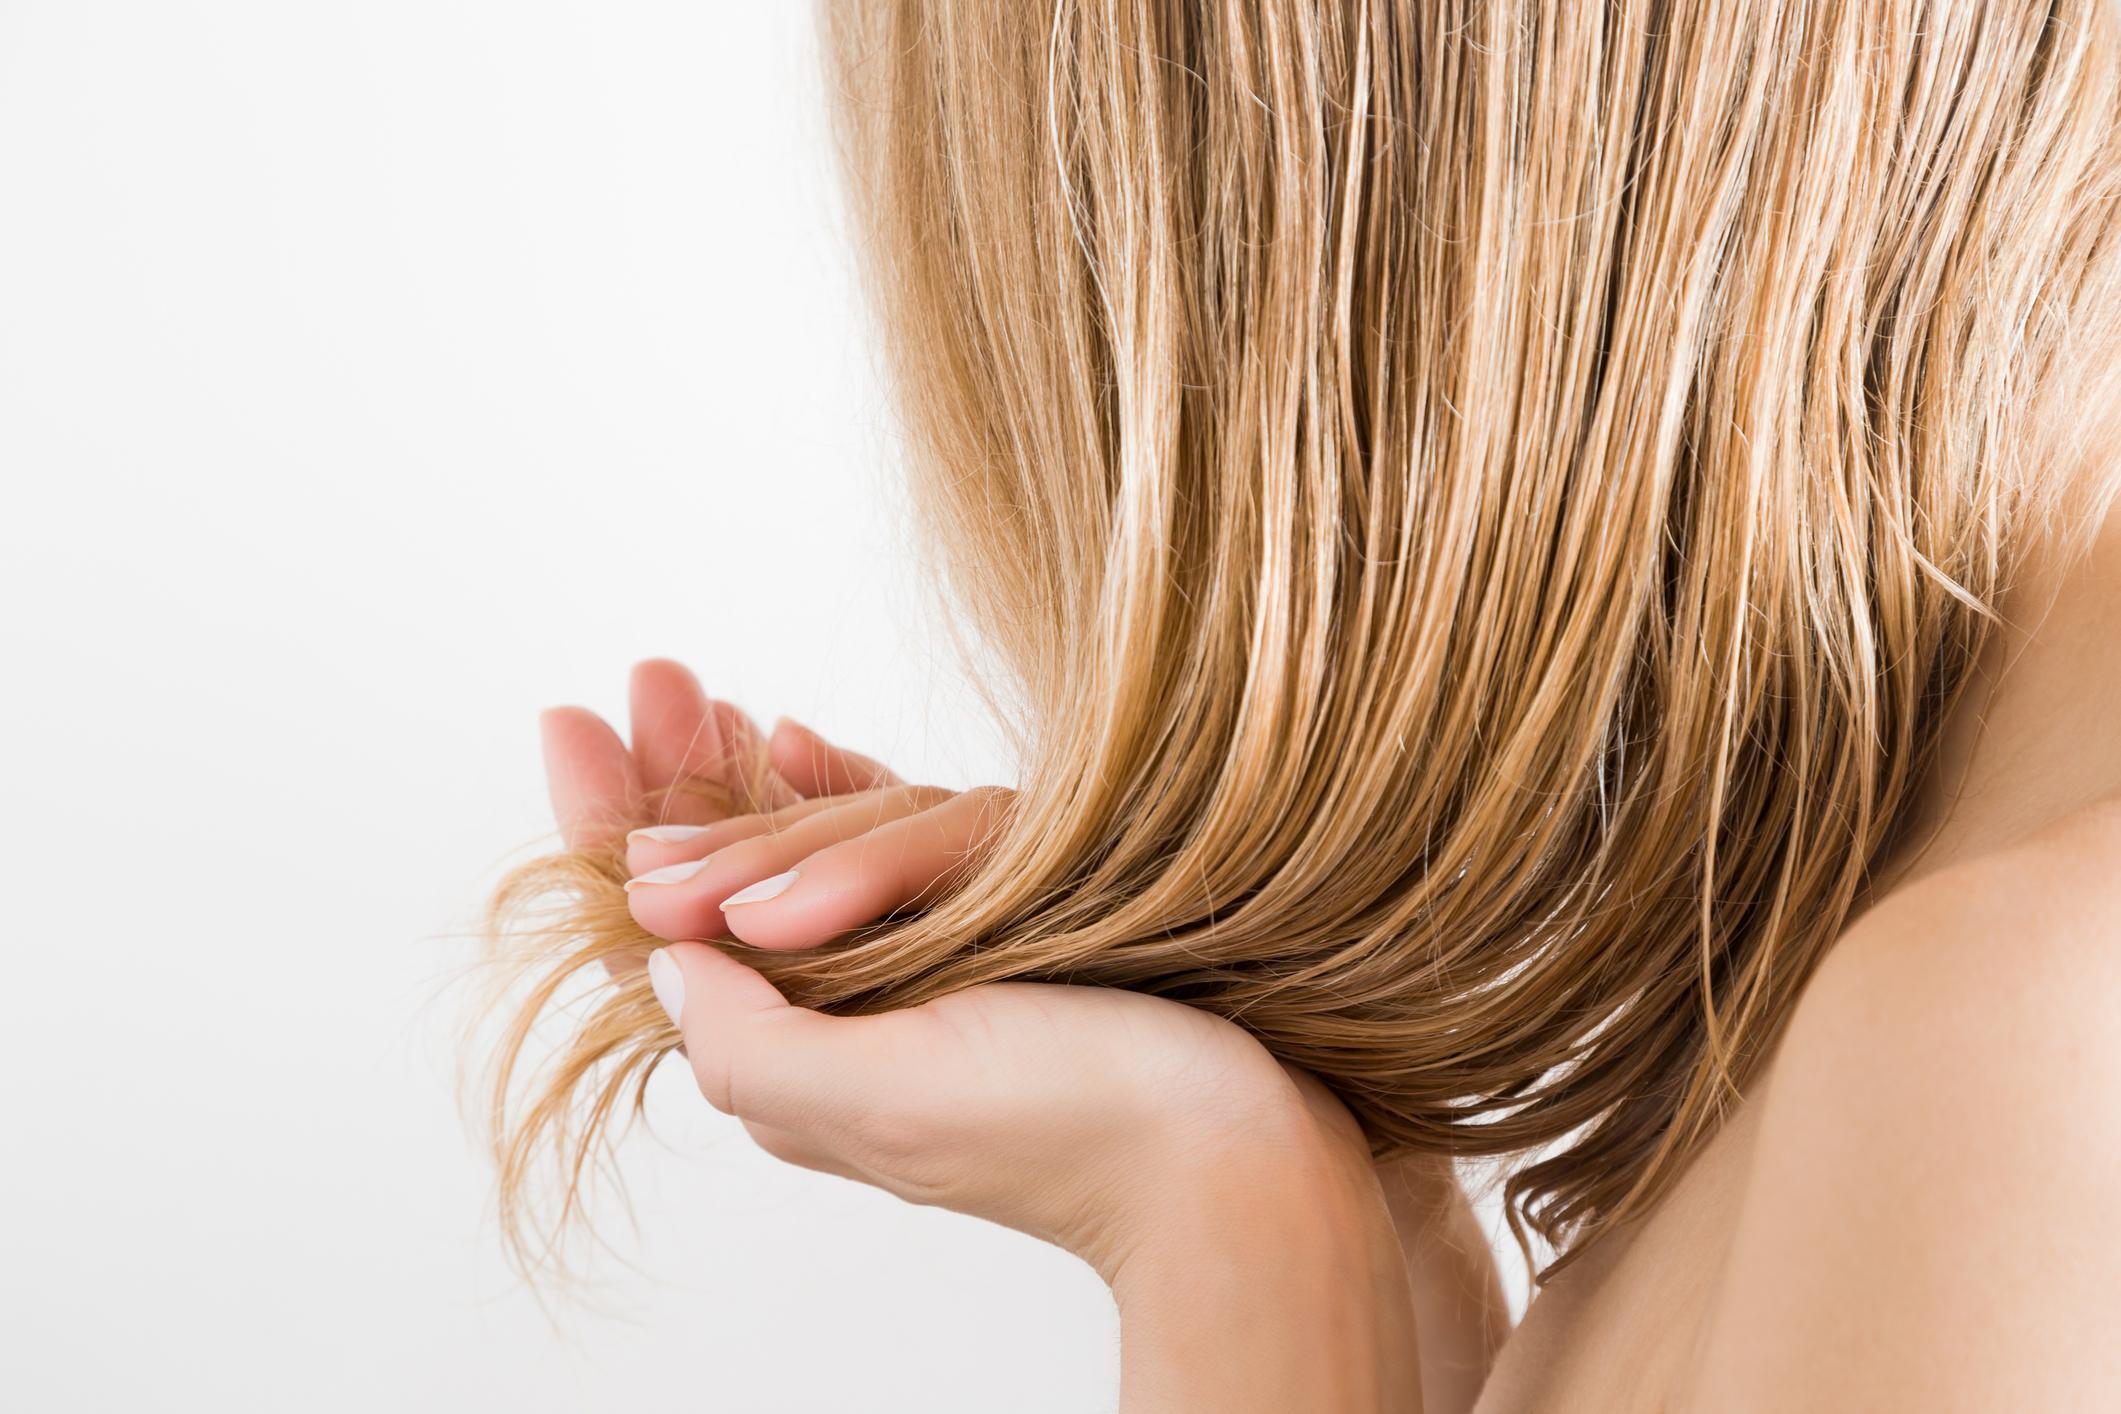 hajhullas-elleni-sampon-noknek